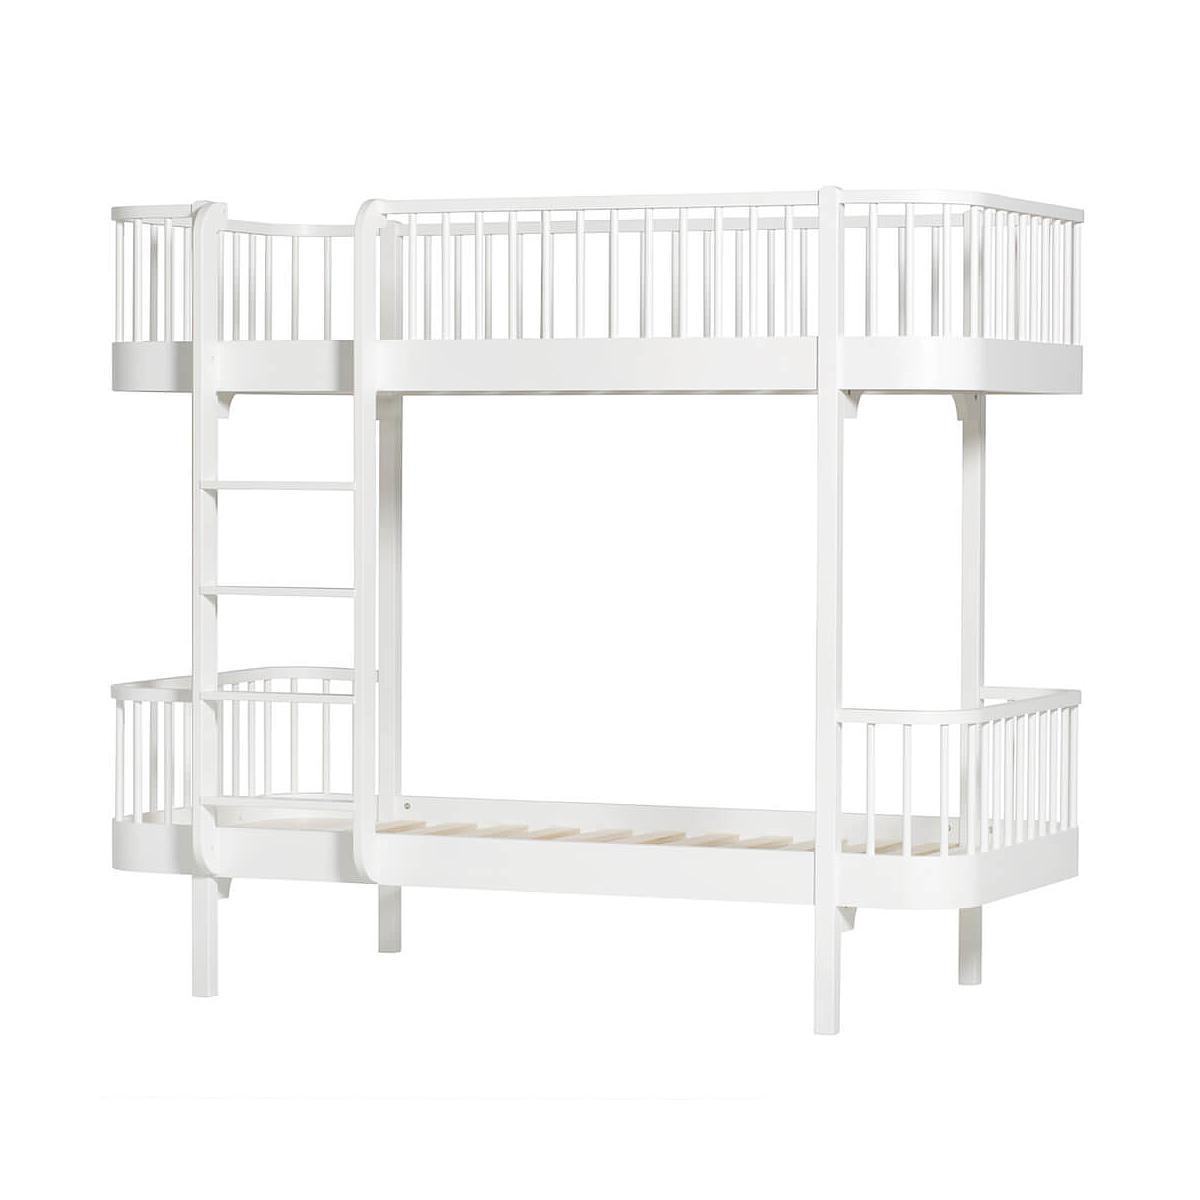 Cama evolutiva literas 90x200cm WOOD ORIGINAL Oliver Furniture blanco